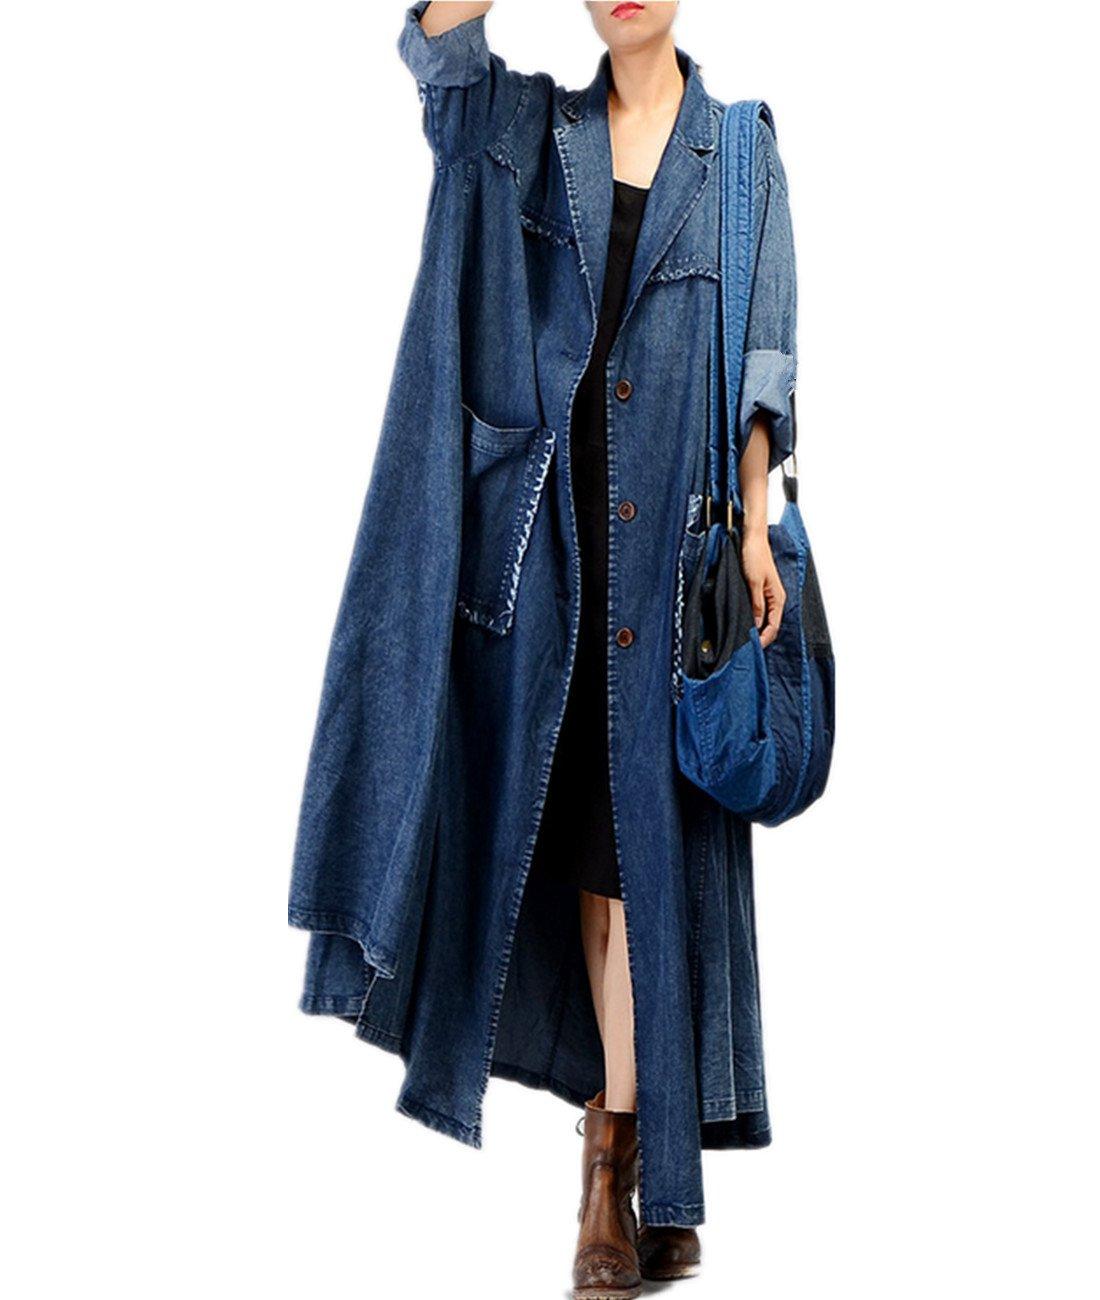 YESNO JQ3 Women Fashion Long Loose Maxi Distressed Denim Trench Jacket Coats Casual Plus Size Lapel Fringed Cut Large Hem, Blue, One Size